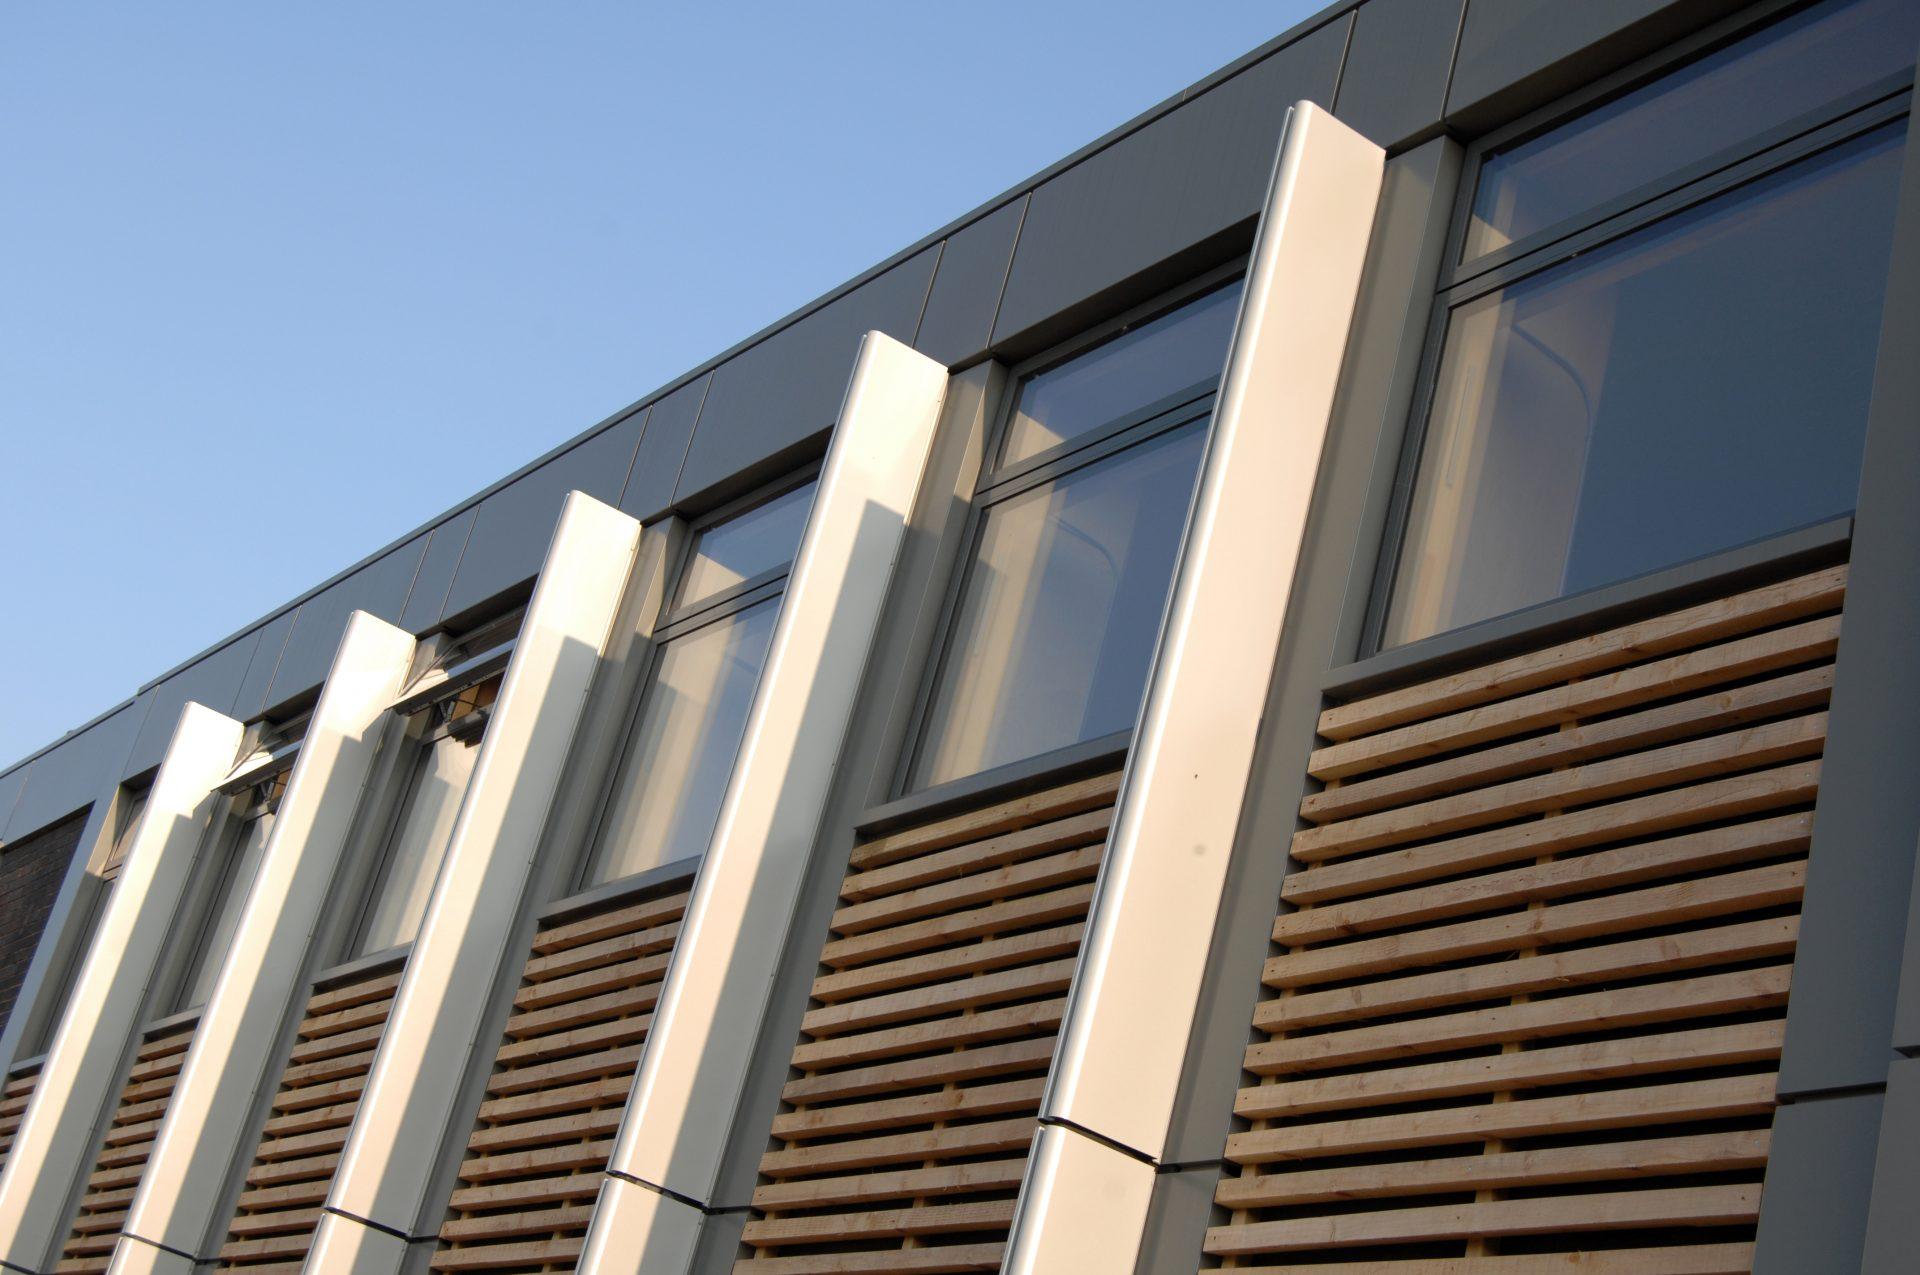 Holme Lacy LRC Cedar Aluminium Shading Fins